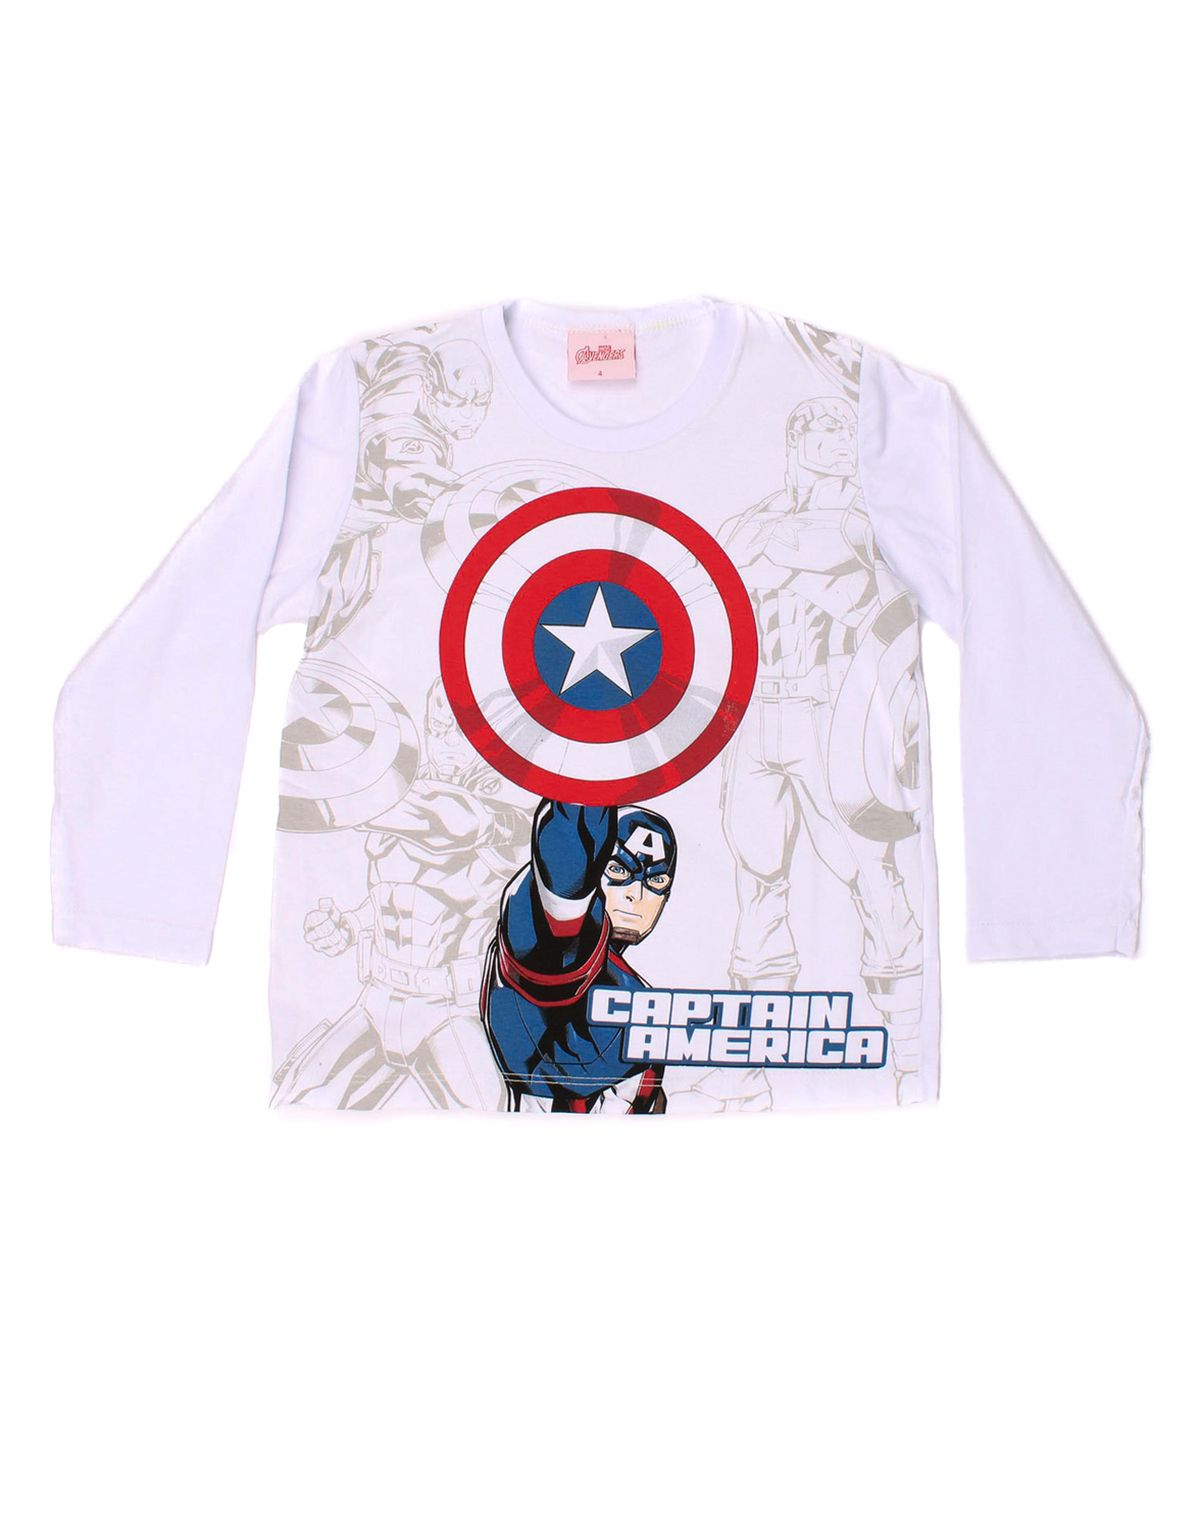 552168004-camiseta-manga-longa-infantil-menino-marvel-capitao-america-branco-10-75f